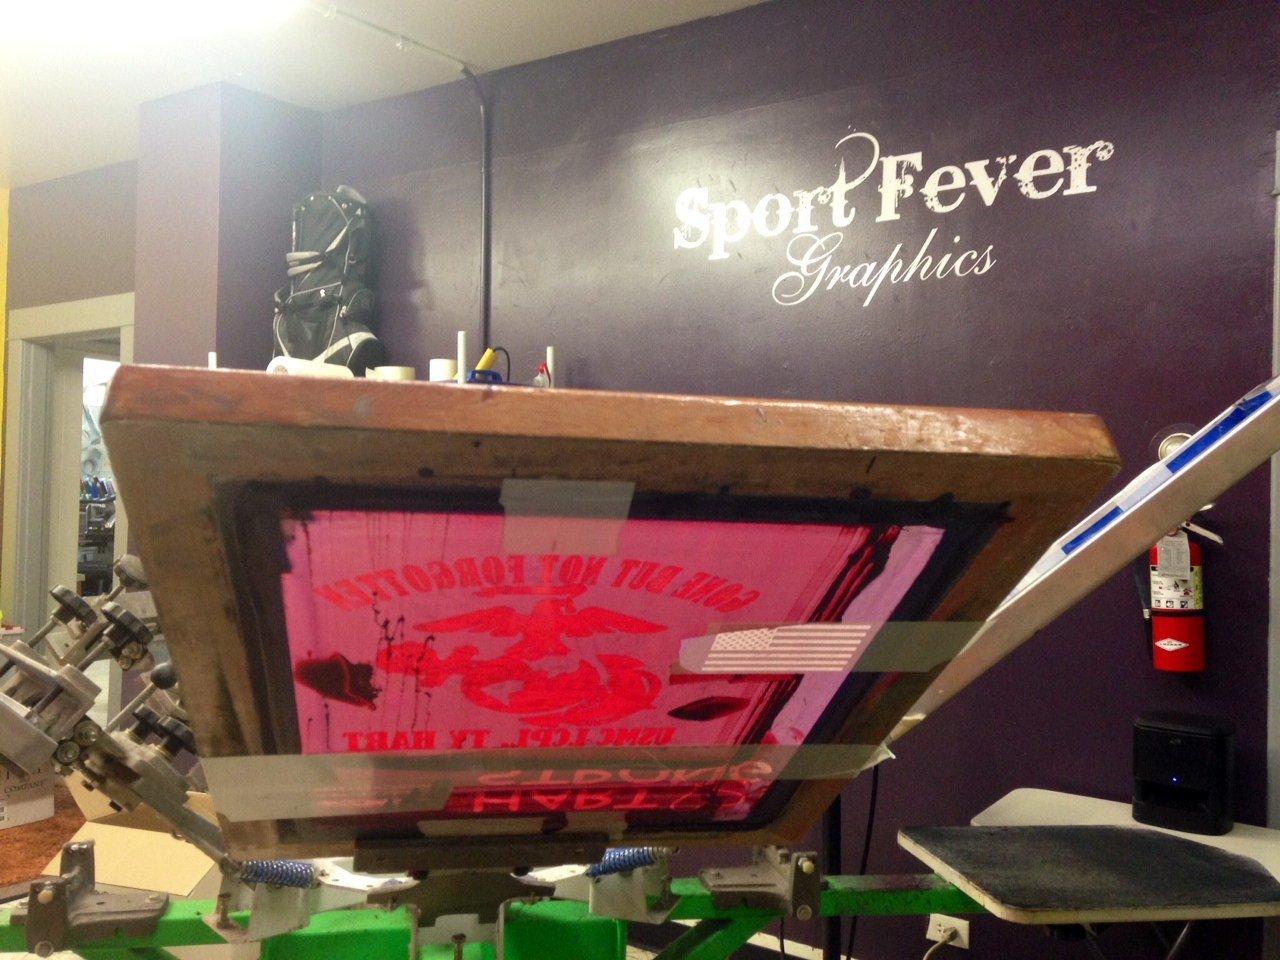 Sport Fever Graphics in Stayton.